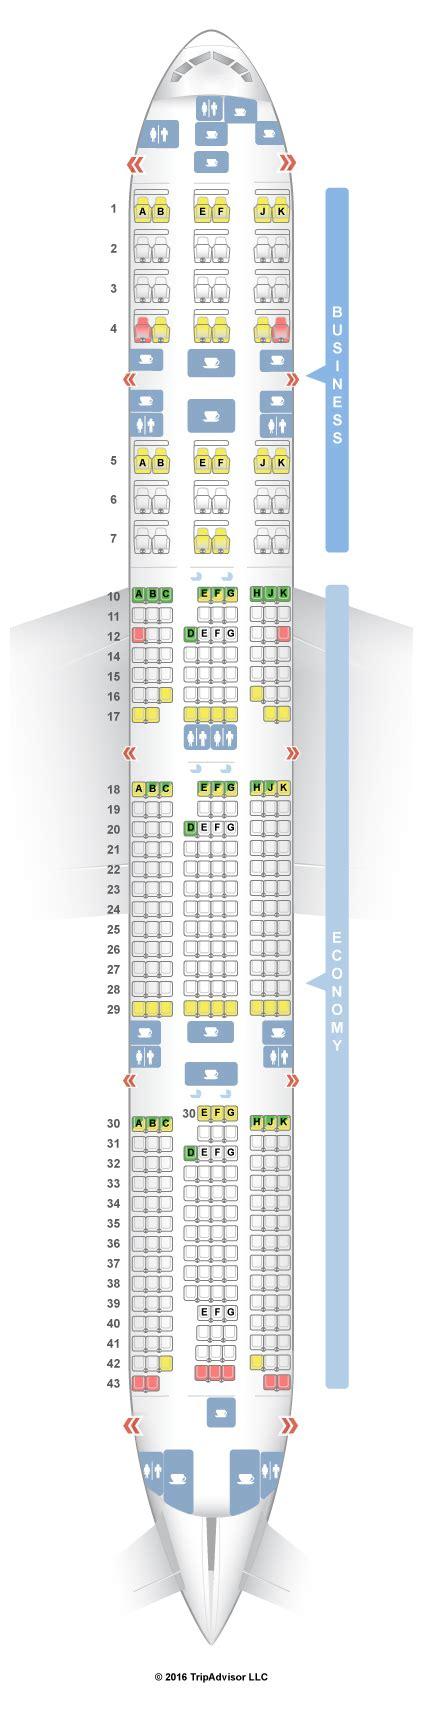 plan si鑒es boeing 777 300er seatguru seat map qatar airways boeing 777 300er 77w v1